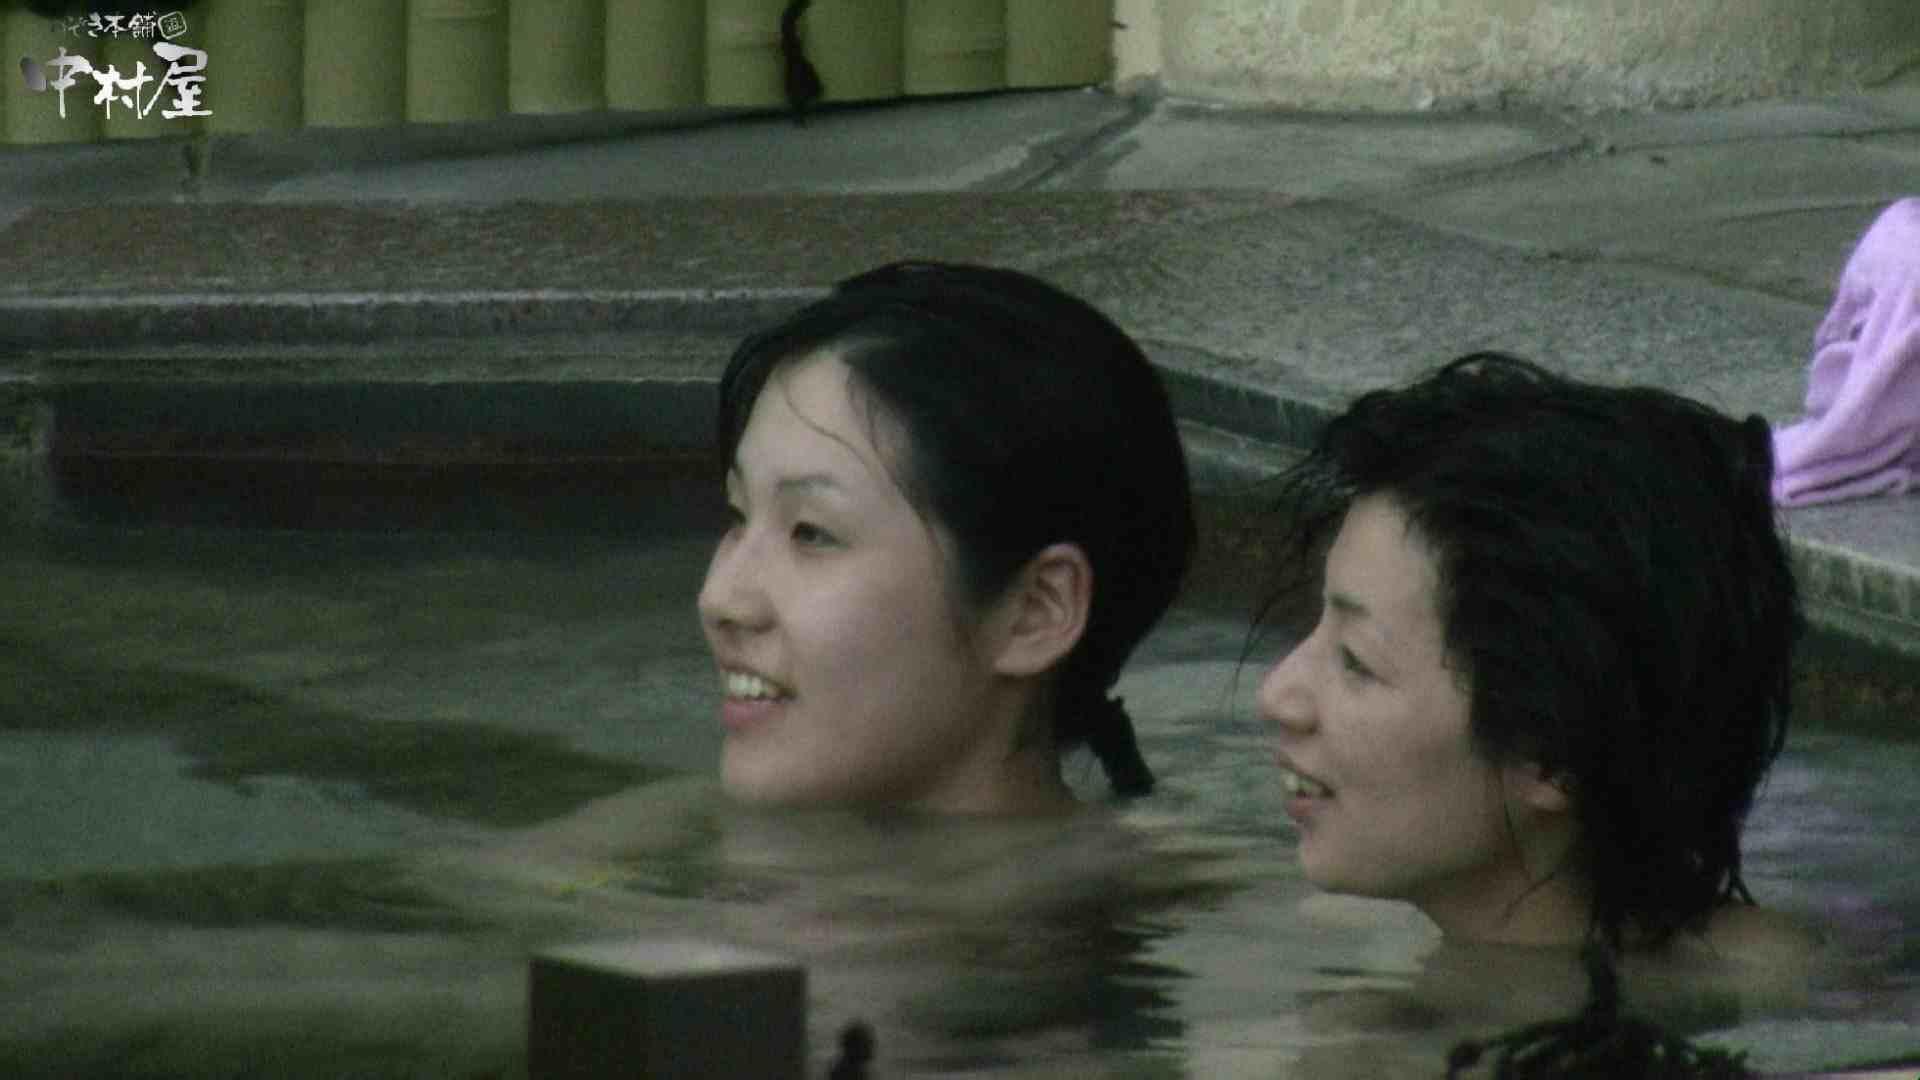 Aquaな露天風呂Vol.983 盗撮  23pic 7